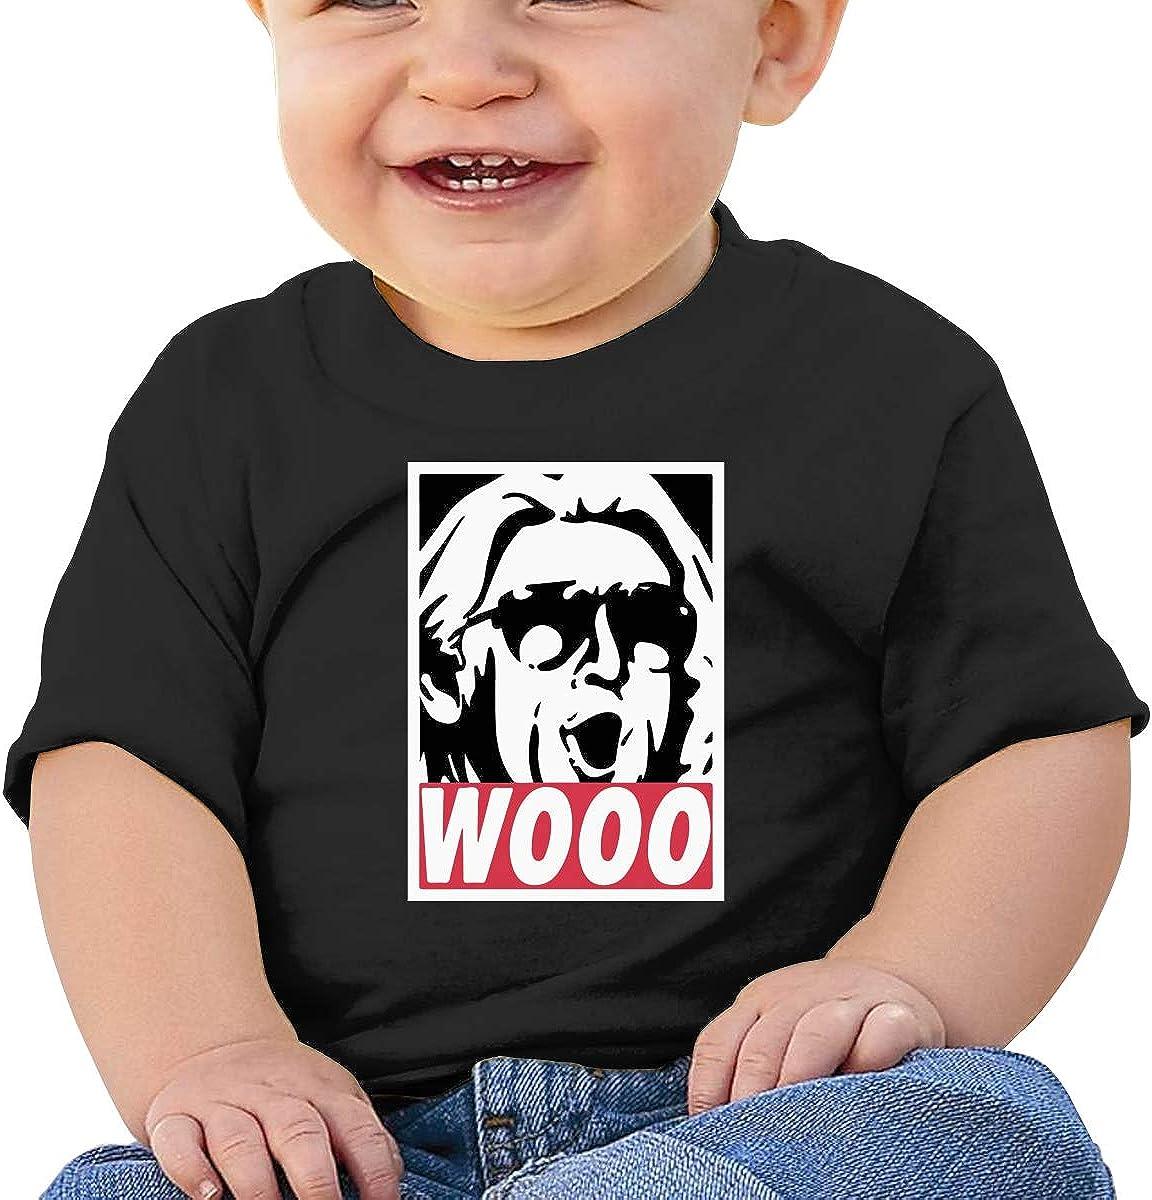 HAOHIYO Baby Wooo-Wrestling Shirts Toddler Cotton Tee